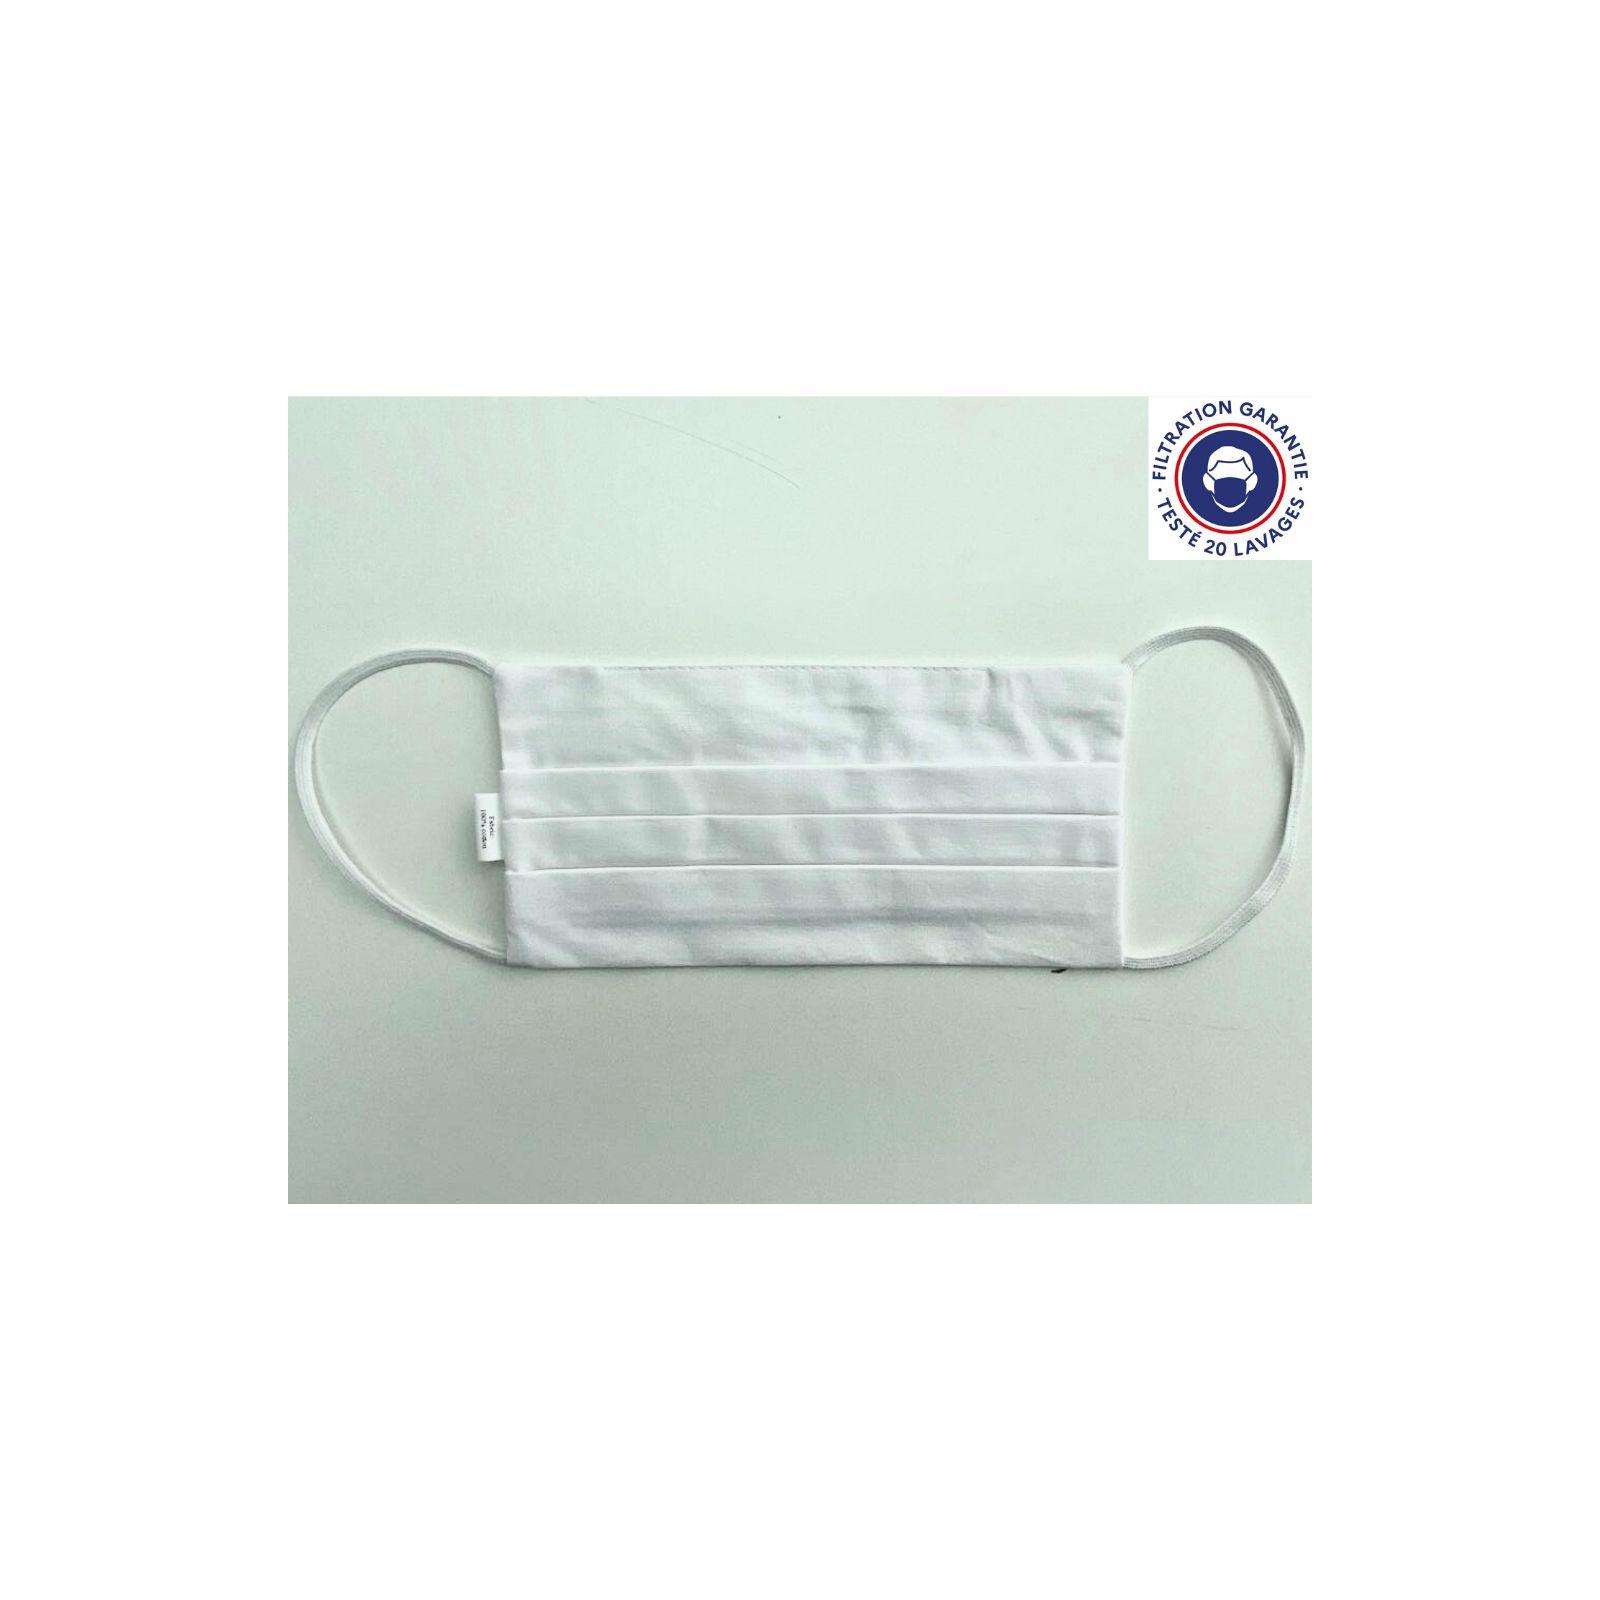 Lot 10 - Masque de protection Catégorie 2 (MASQUE10) vue logo